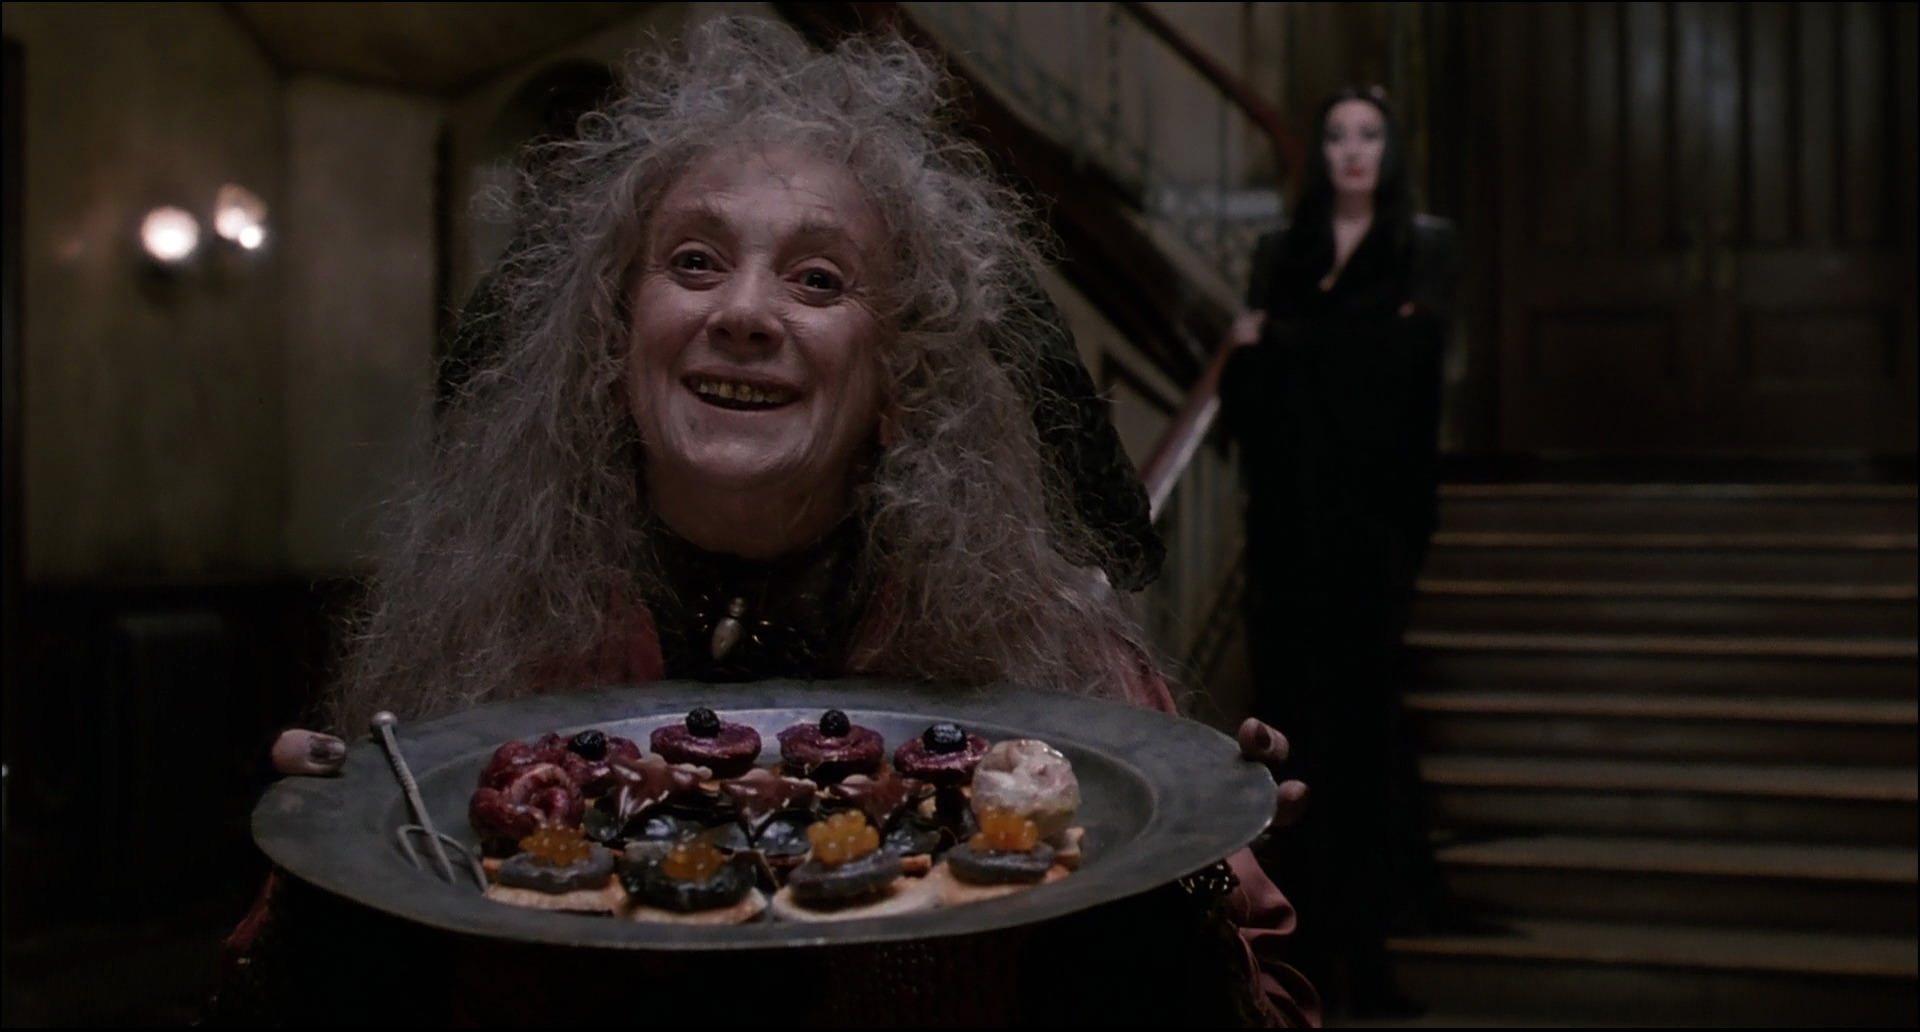 Anjelica Huston and Judith Malina in The Addams Family (1991)